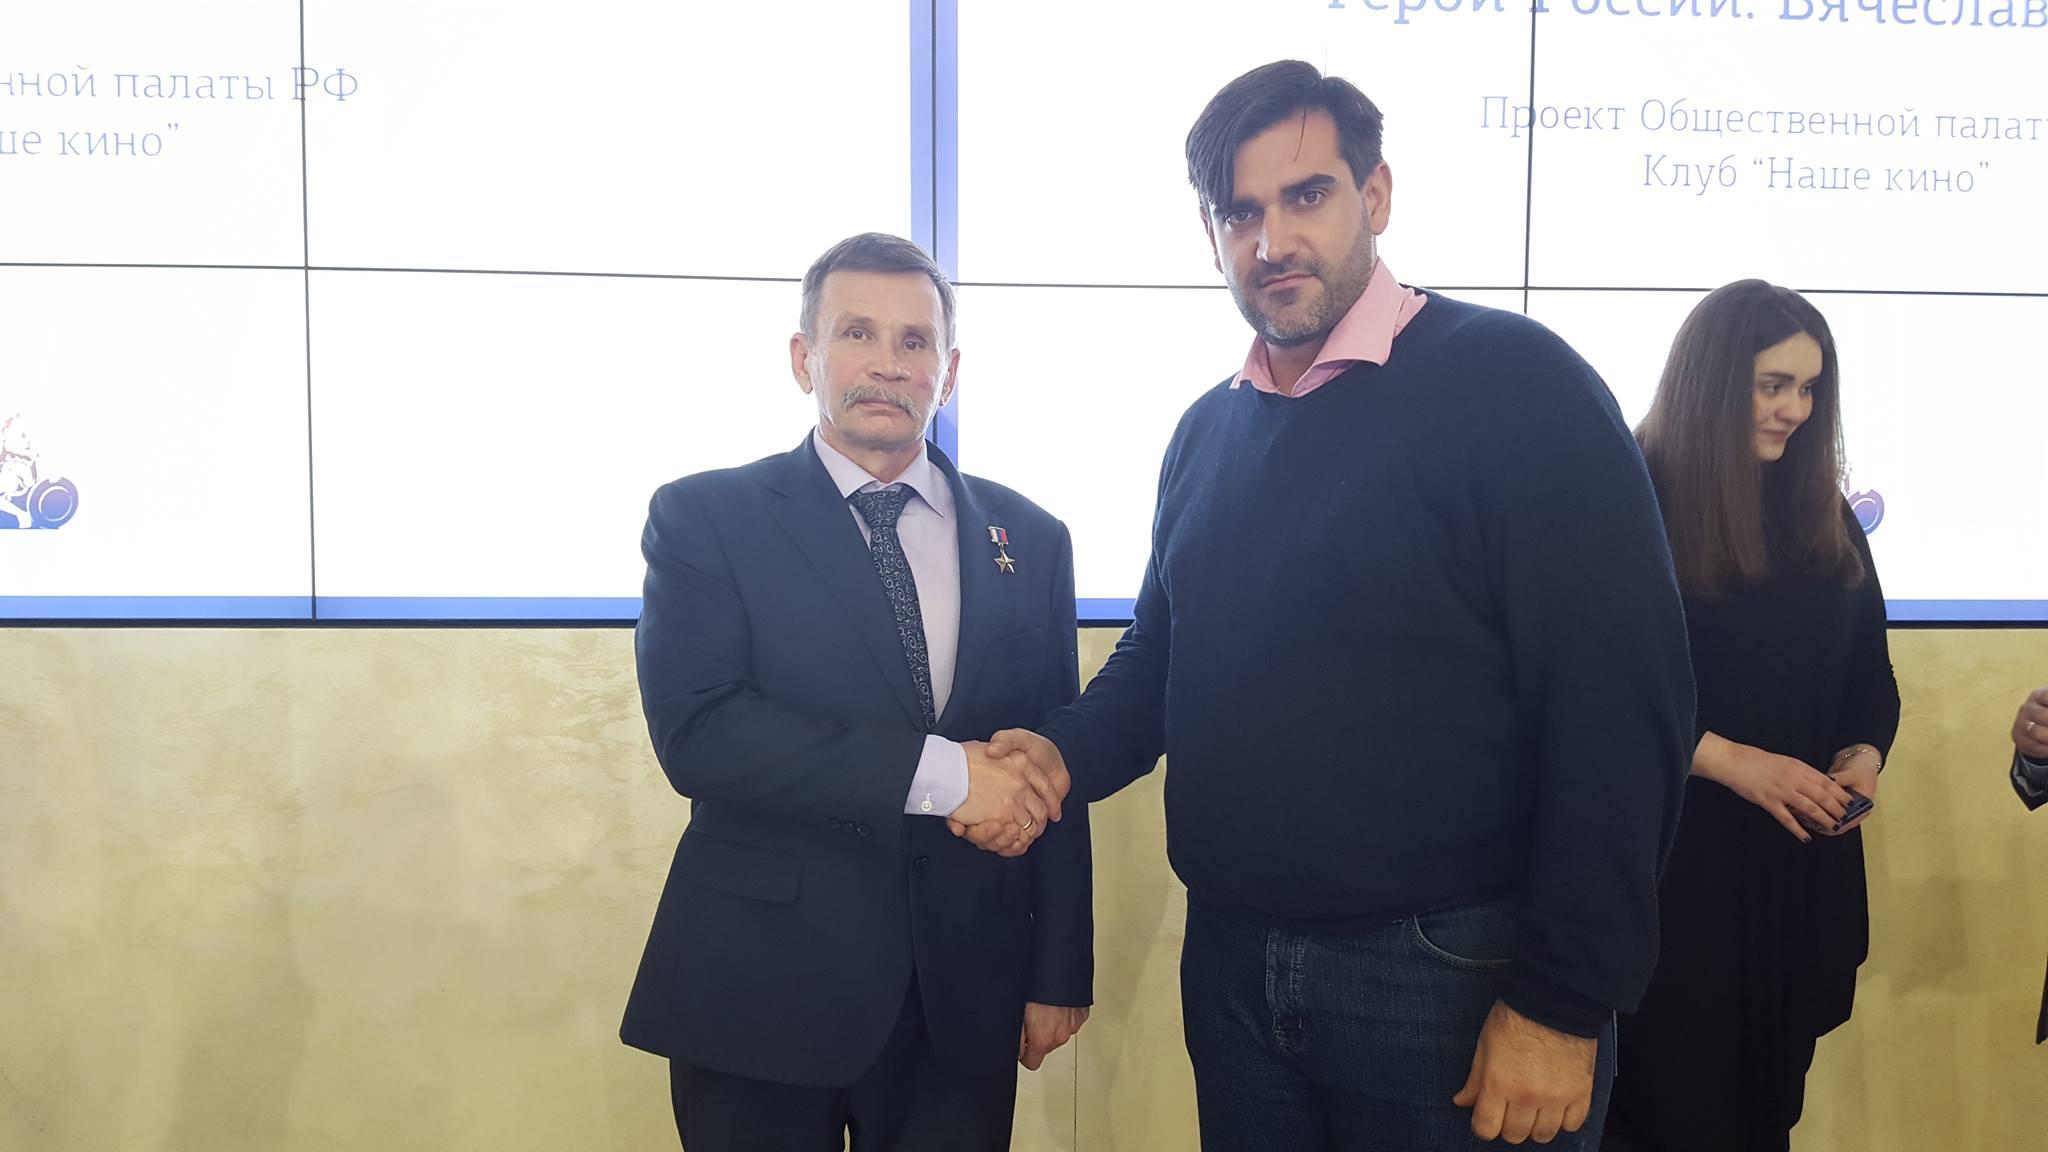 Бочаров Вячеслав Алексеевич и Борис Анзов